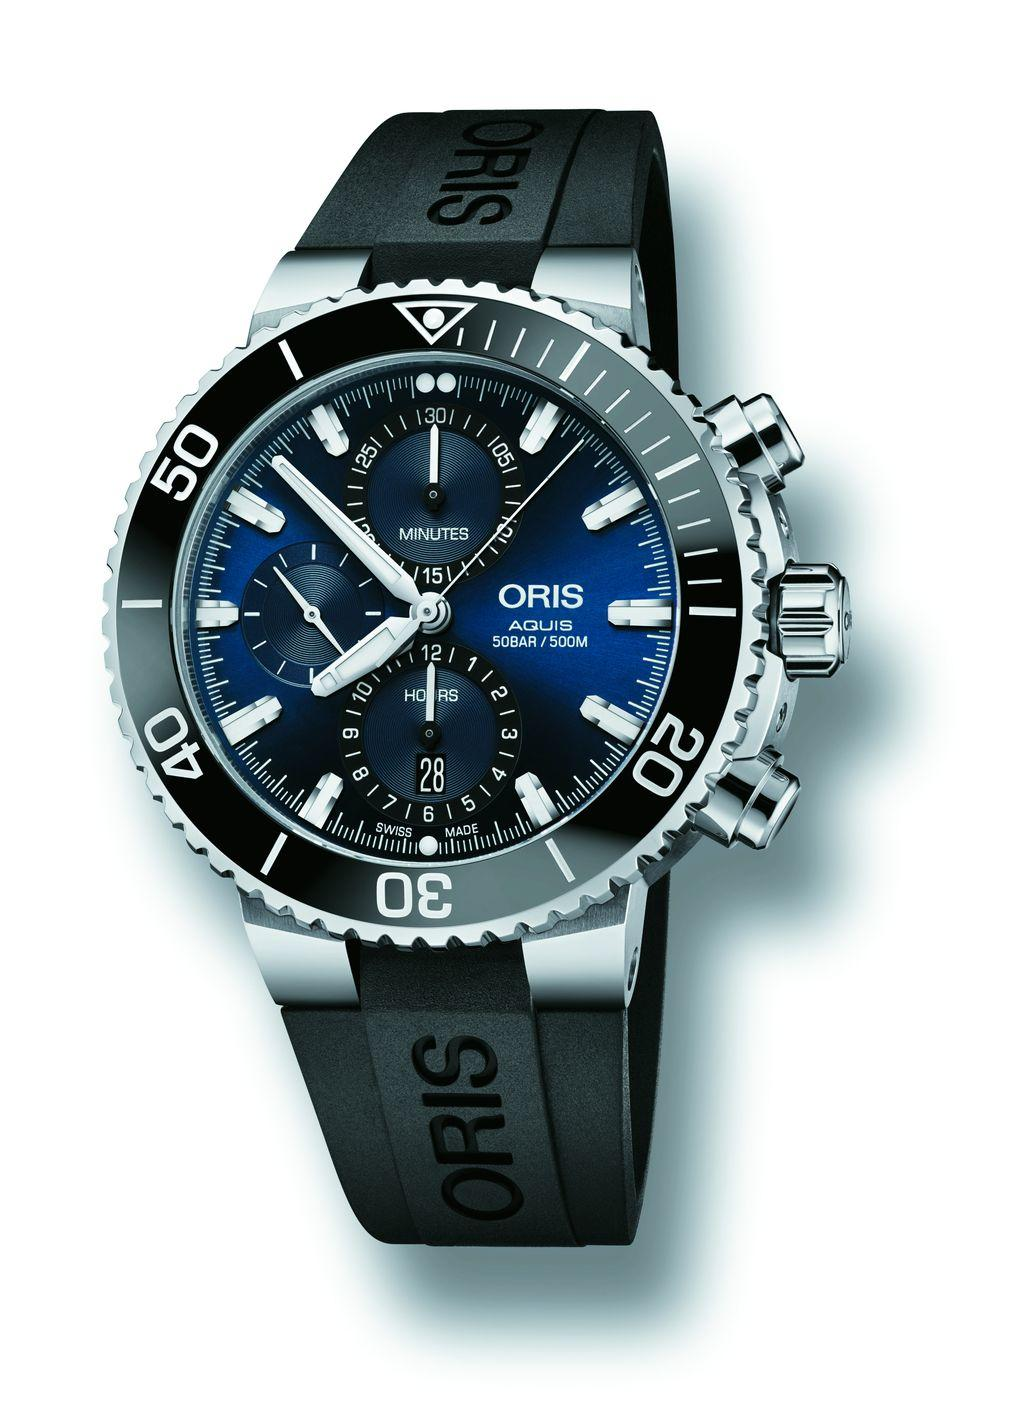 ORIS Aquis計時碼錶